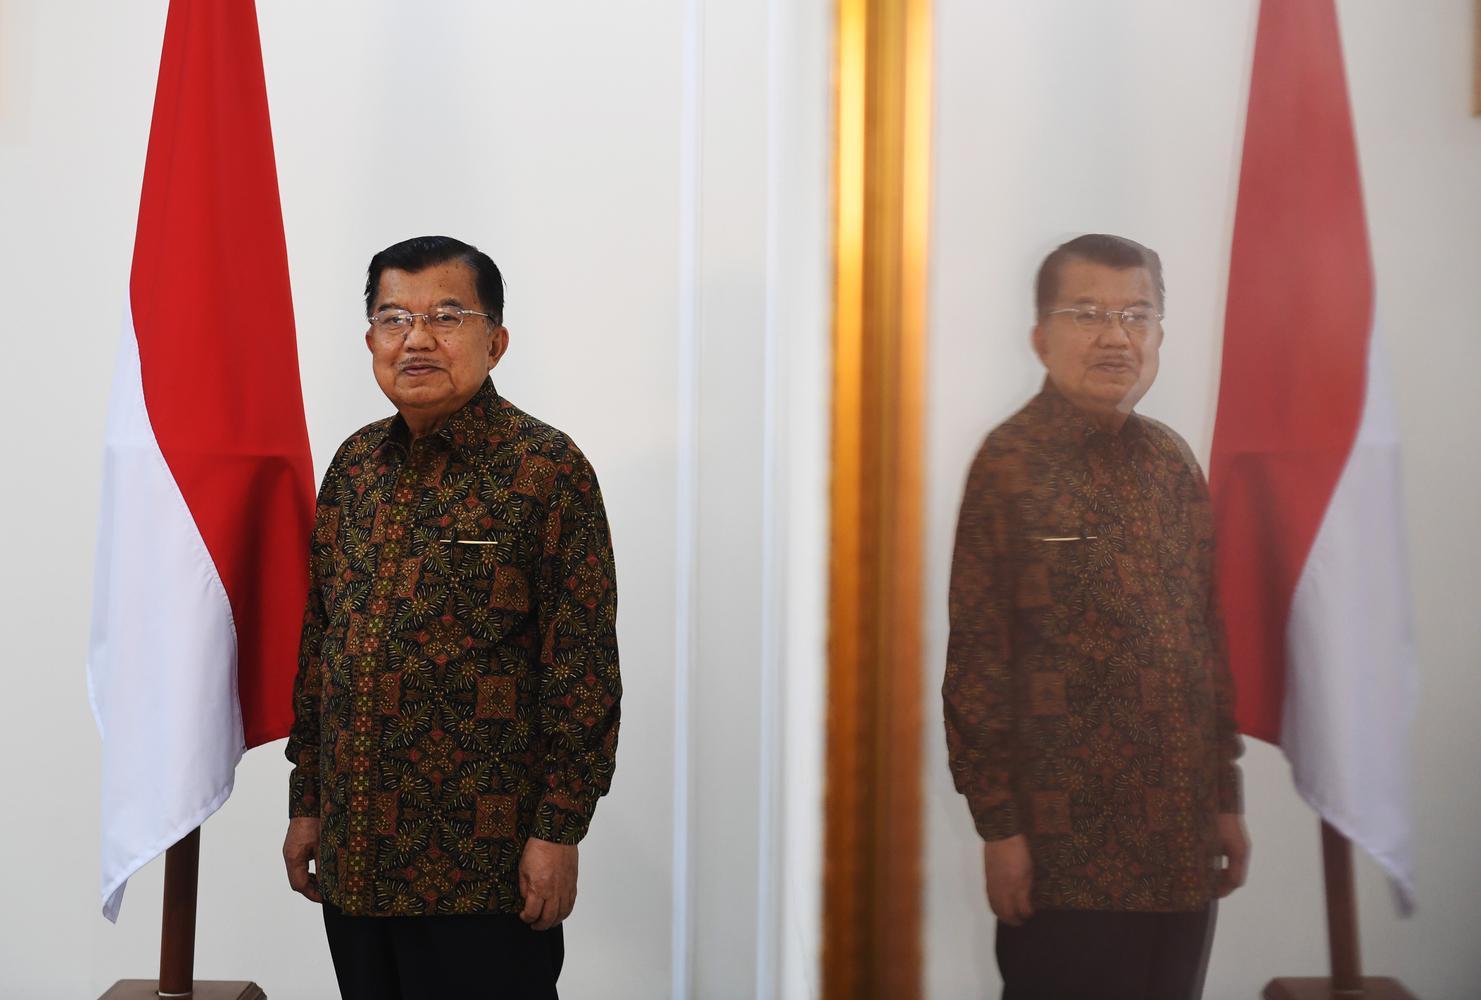 Ketua Dewan Masjid Indonesia Jusuf Kalla berharap Masjid Apung Jakarta tak terpapar radikalisme.